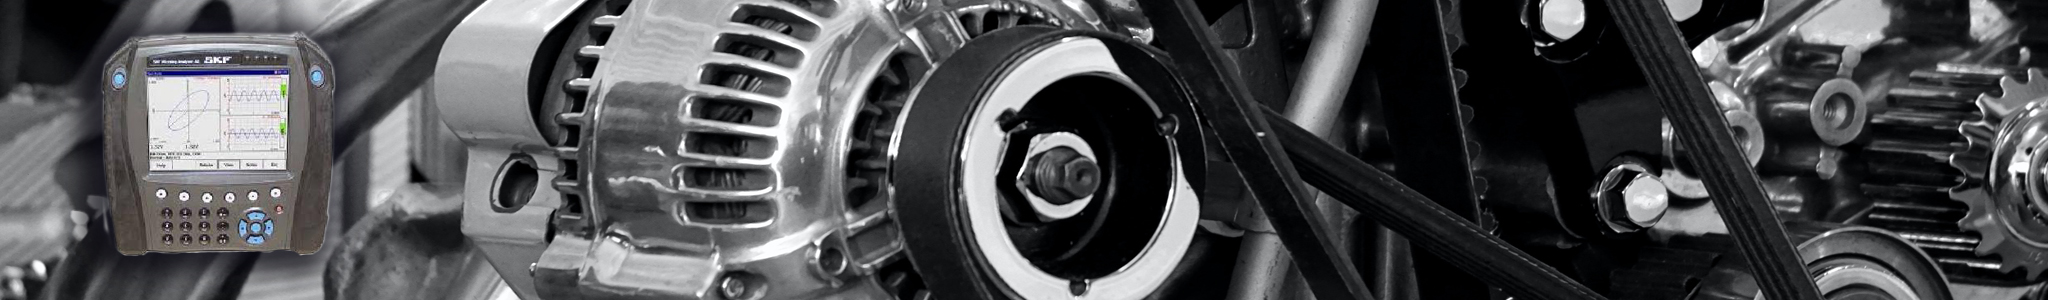 analisi vibrazioni macchine rotanti monitoring